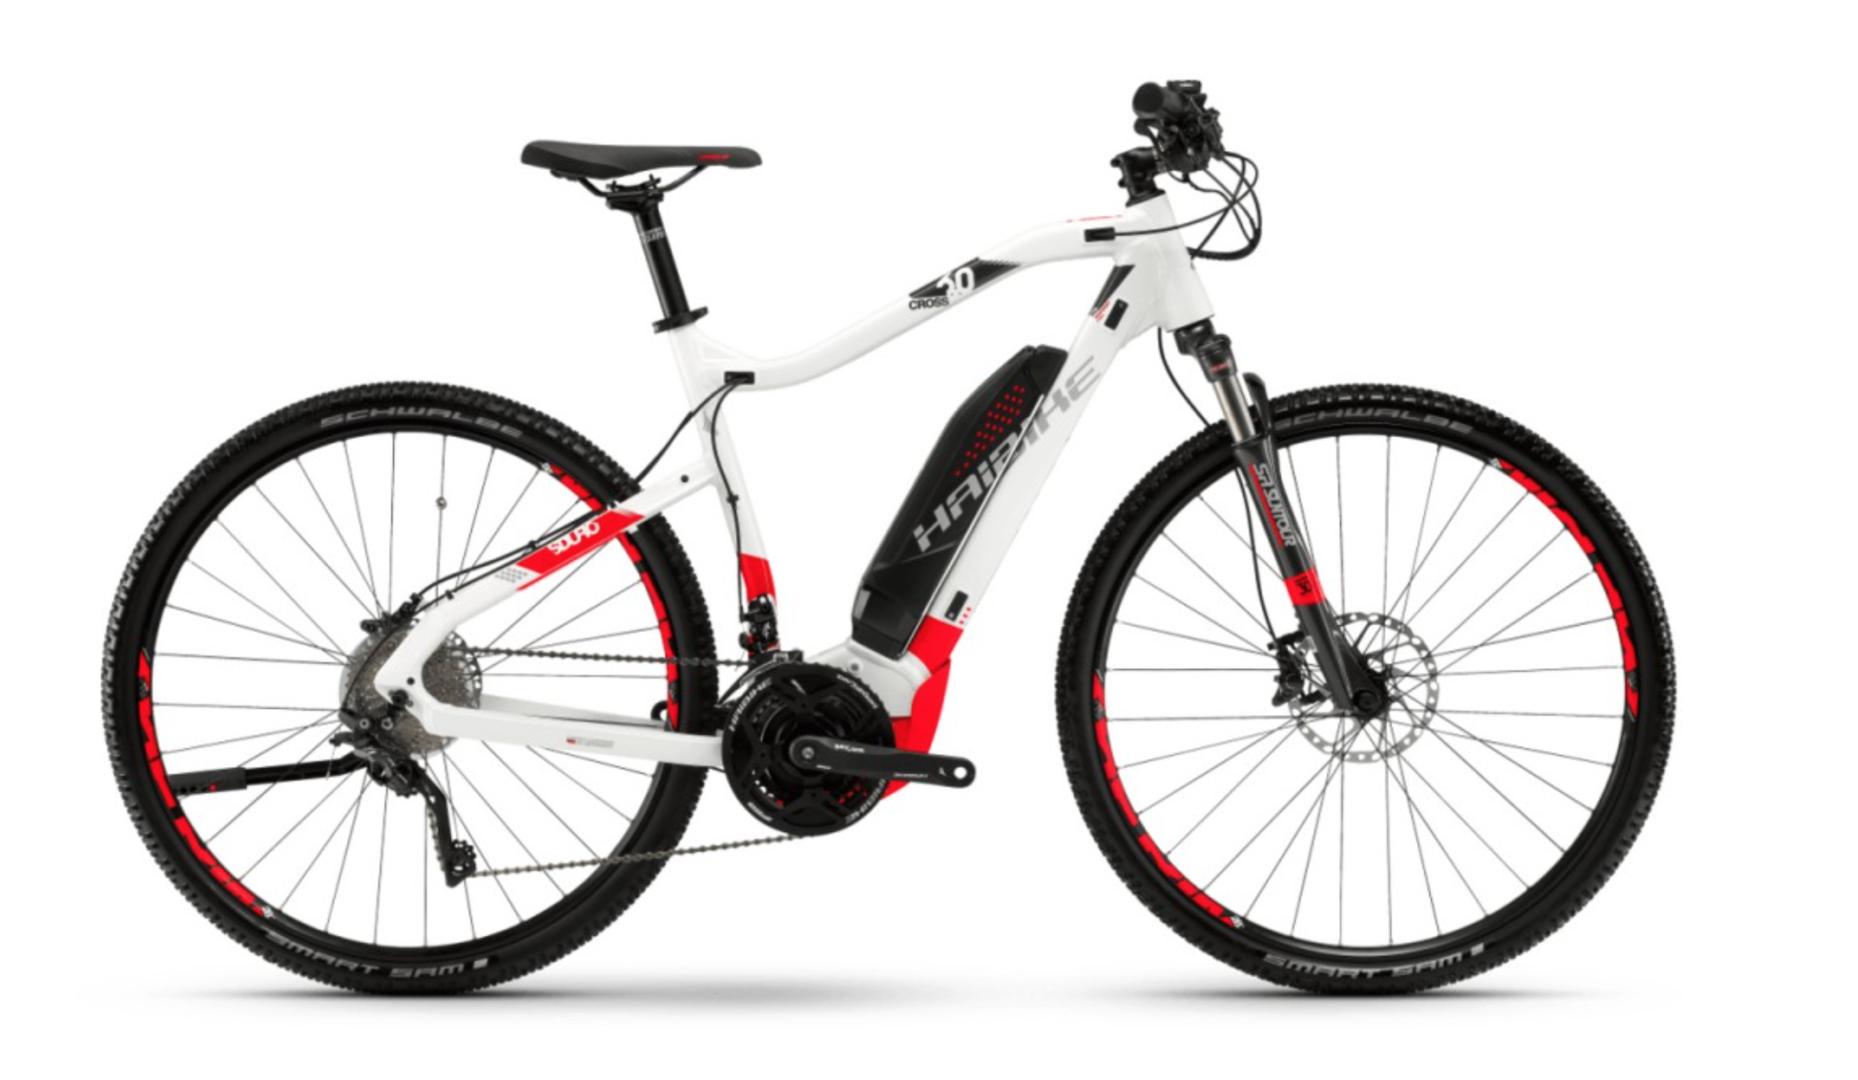 haibike sduro cross 6 0 500wh yamaha elektro fahrrad 2018 neu. Black Bedroom Furniture Sets. Home Design Ideas